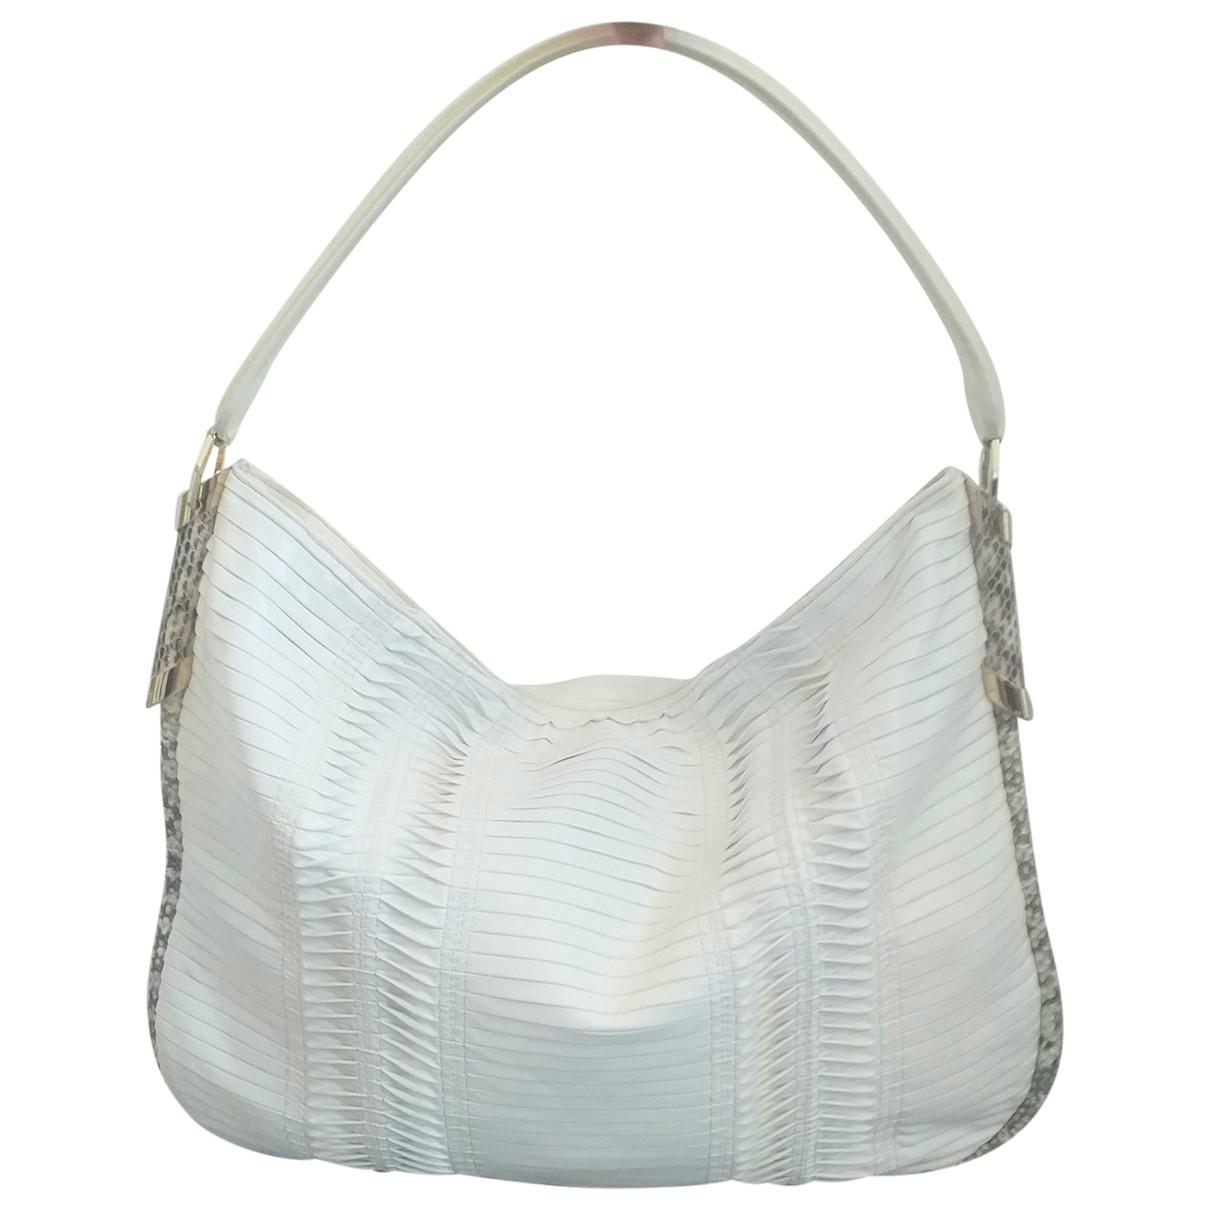 Jimmy Choo \N White Leather handbag for Women \N